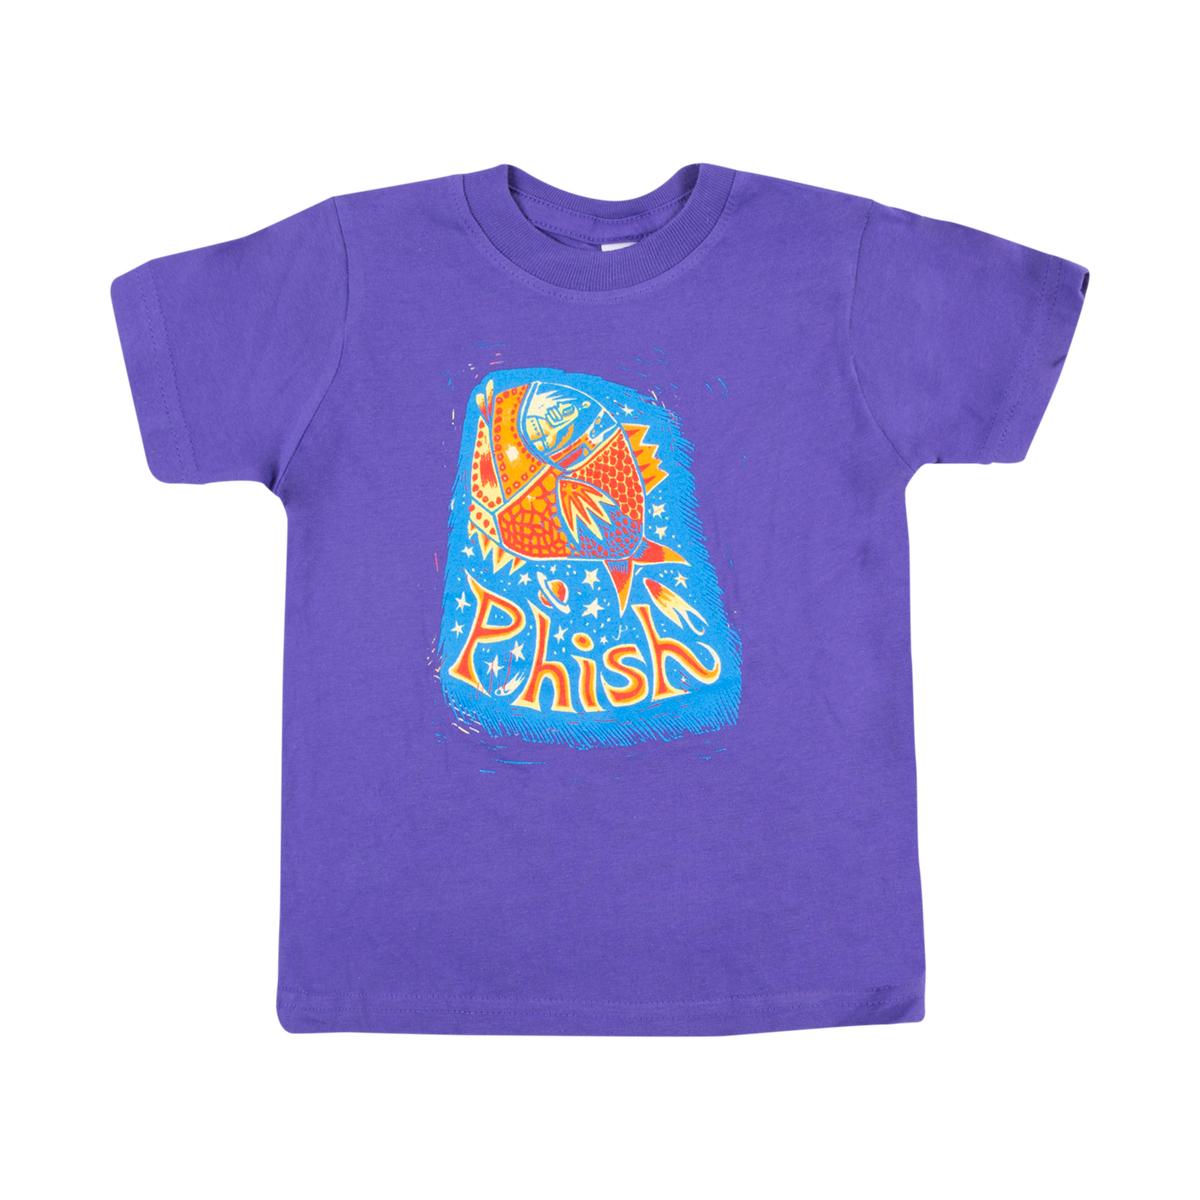 Pollock Rocket Toddler T